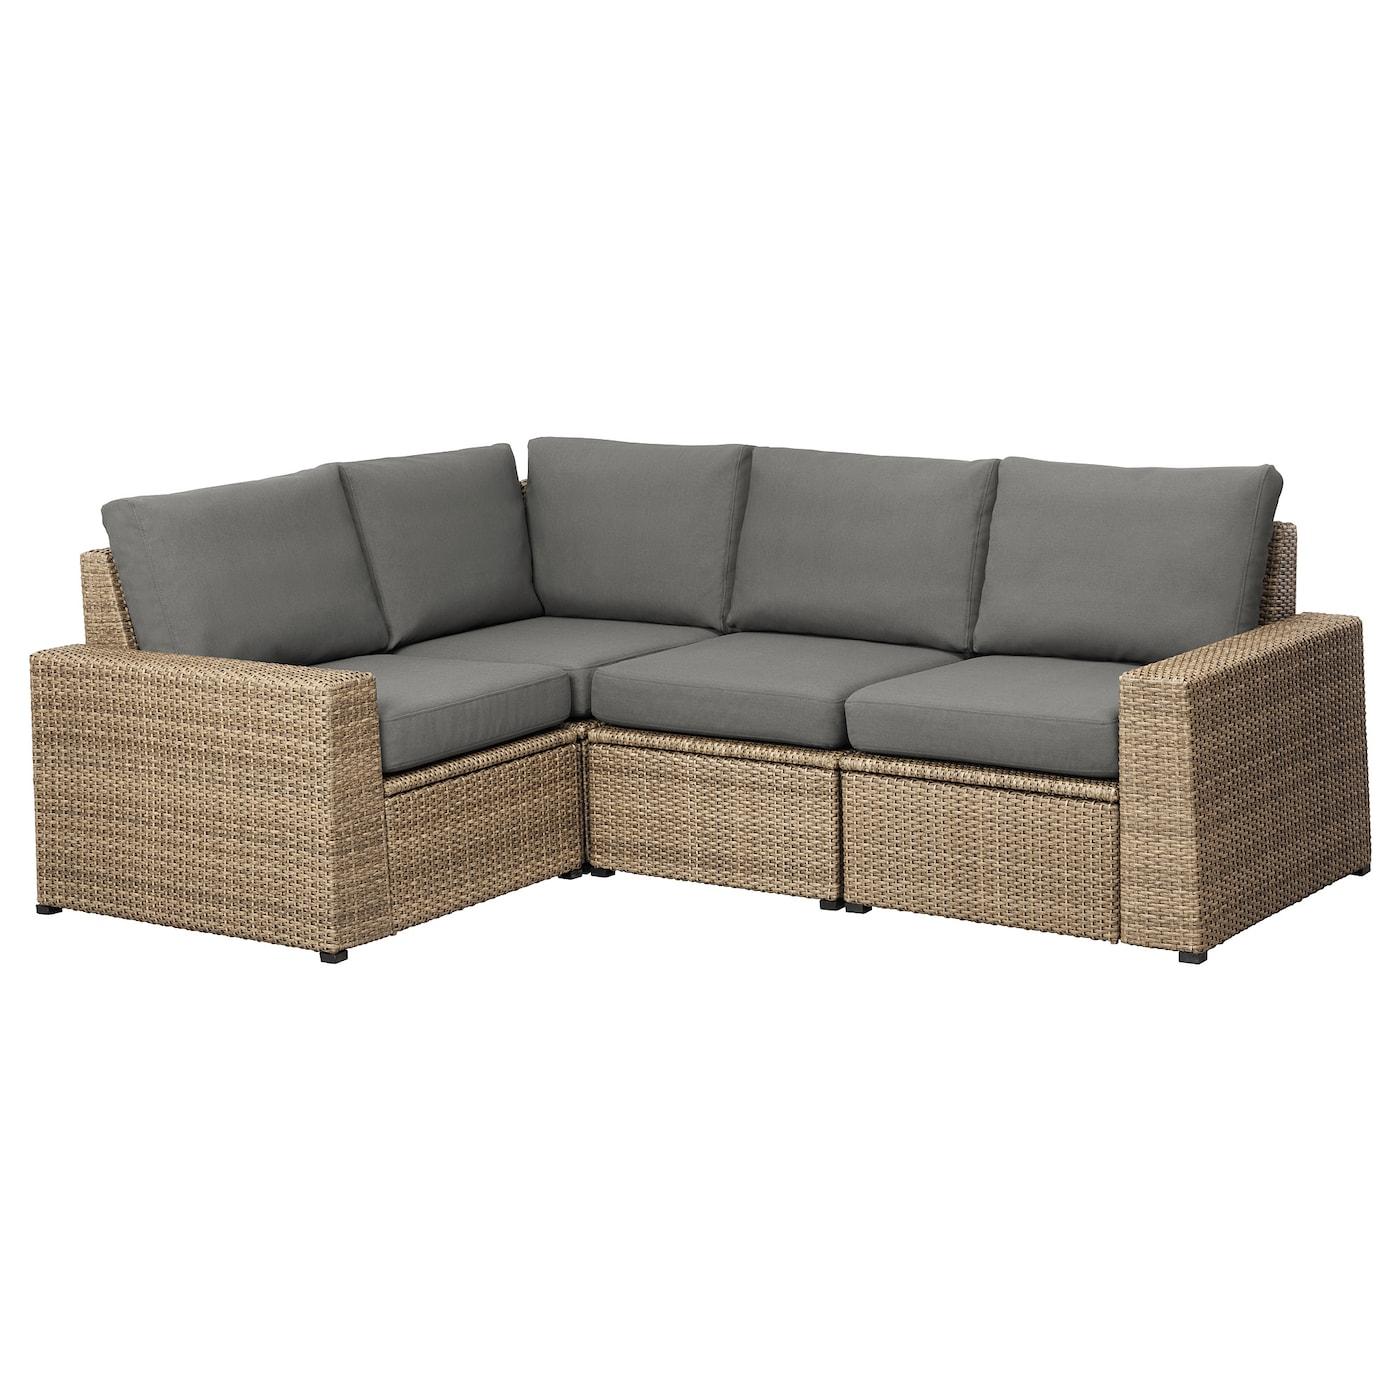 SOLLERÖN Modular Corner Sofa 3-seat, Outdoor Brown/frösön